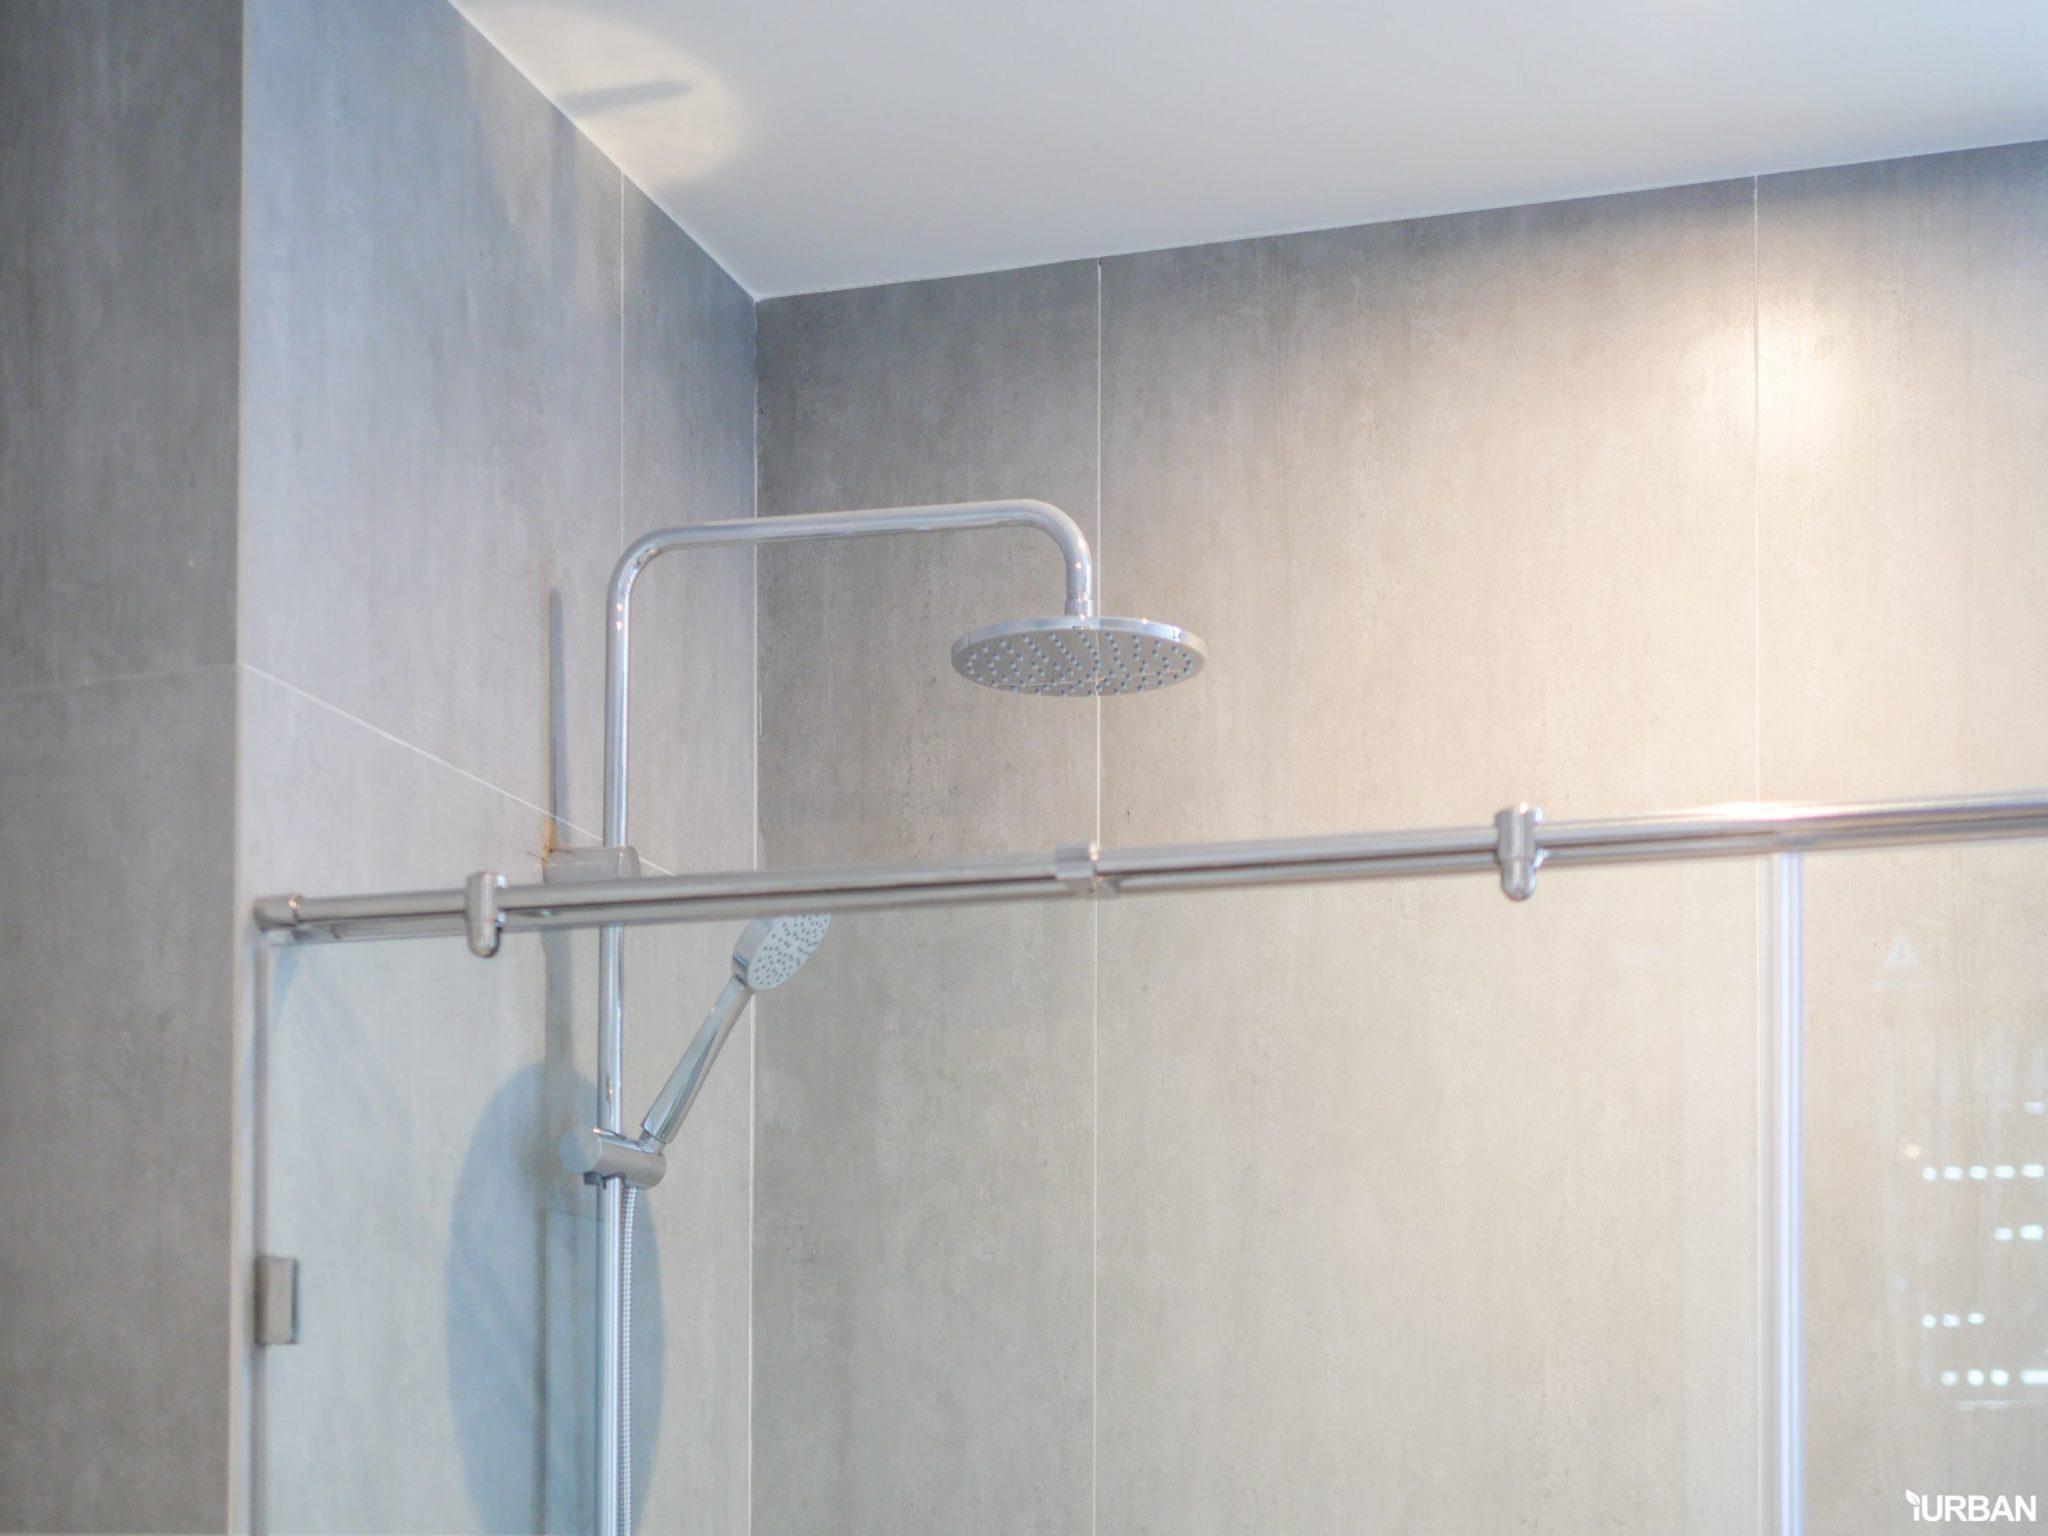 AIRES RAMA9 รีวิว Luxury Townhome 3.5 ชั้น + Rooftop ออกแบบสวย ย่านพระราม9 (ใกล้ รพ.สมิติเวช) 76 - AIRES